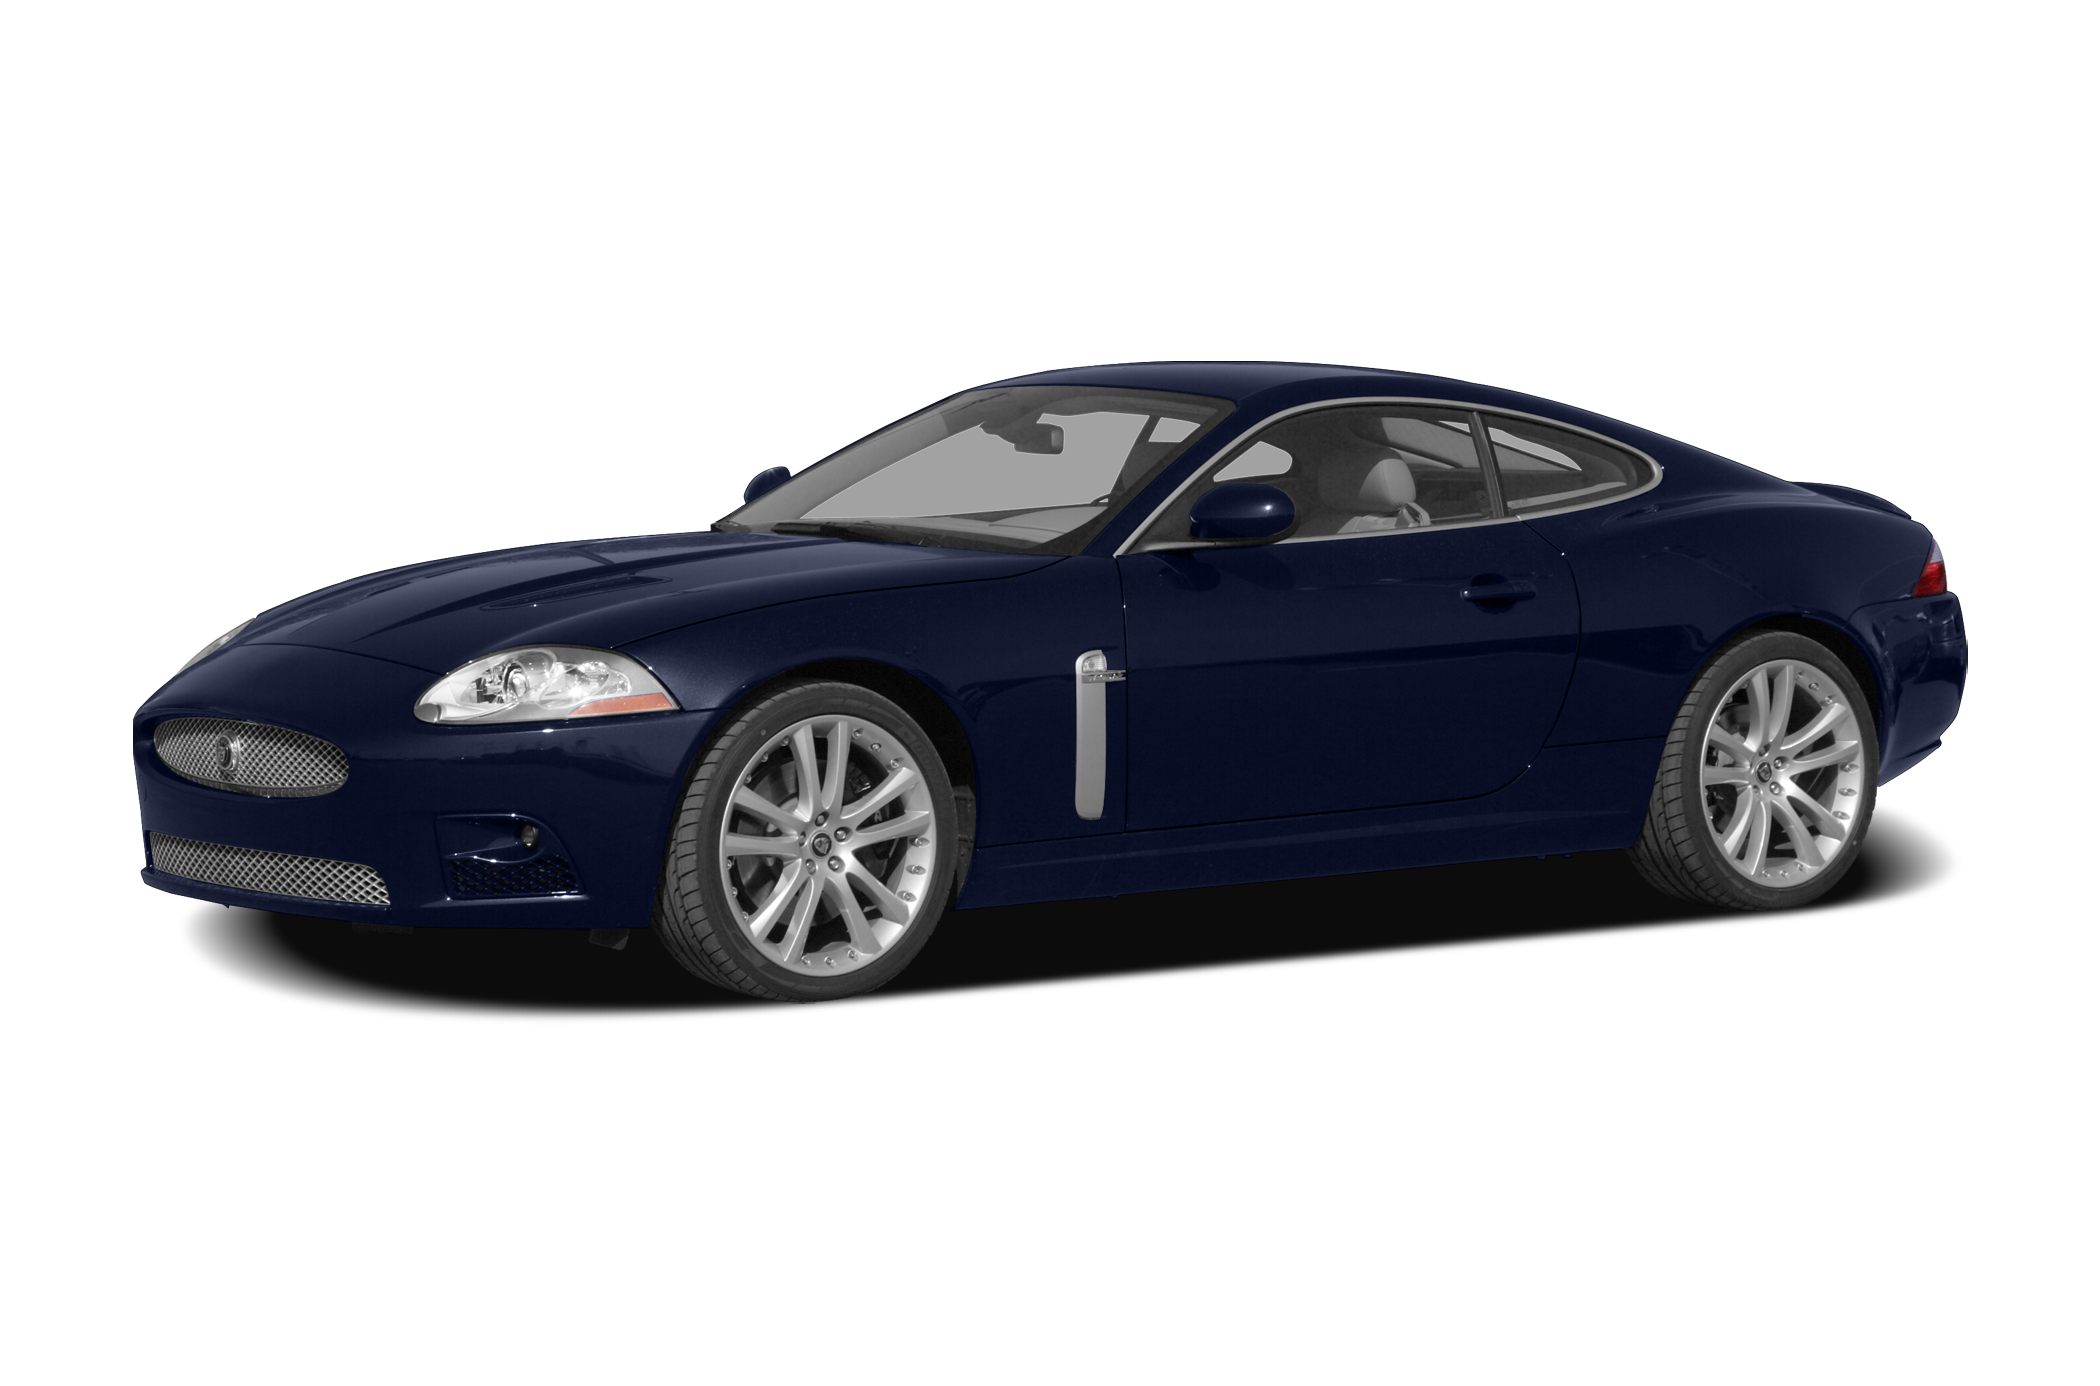 paramount asp jaguar motors nw xk sale detail for